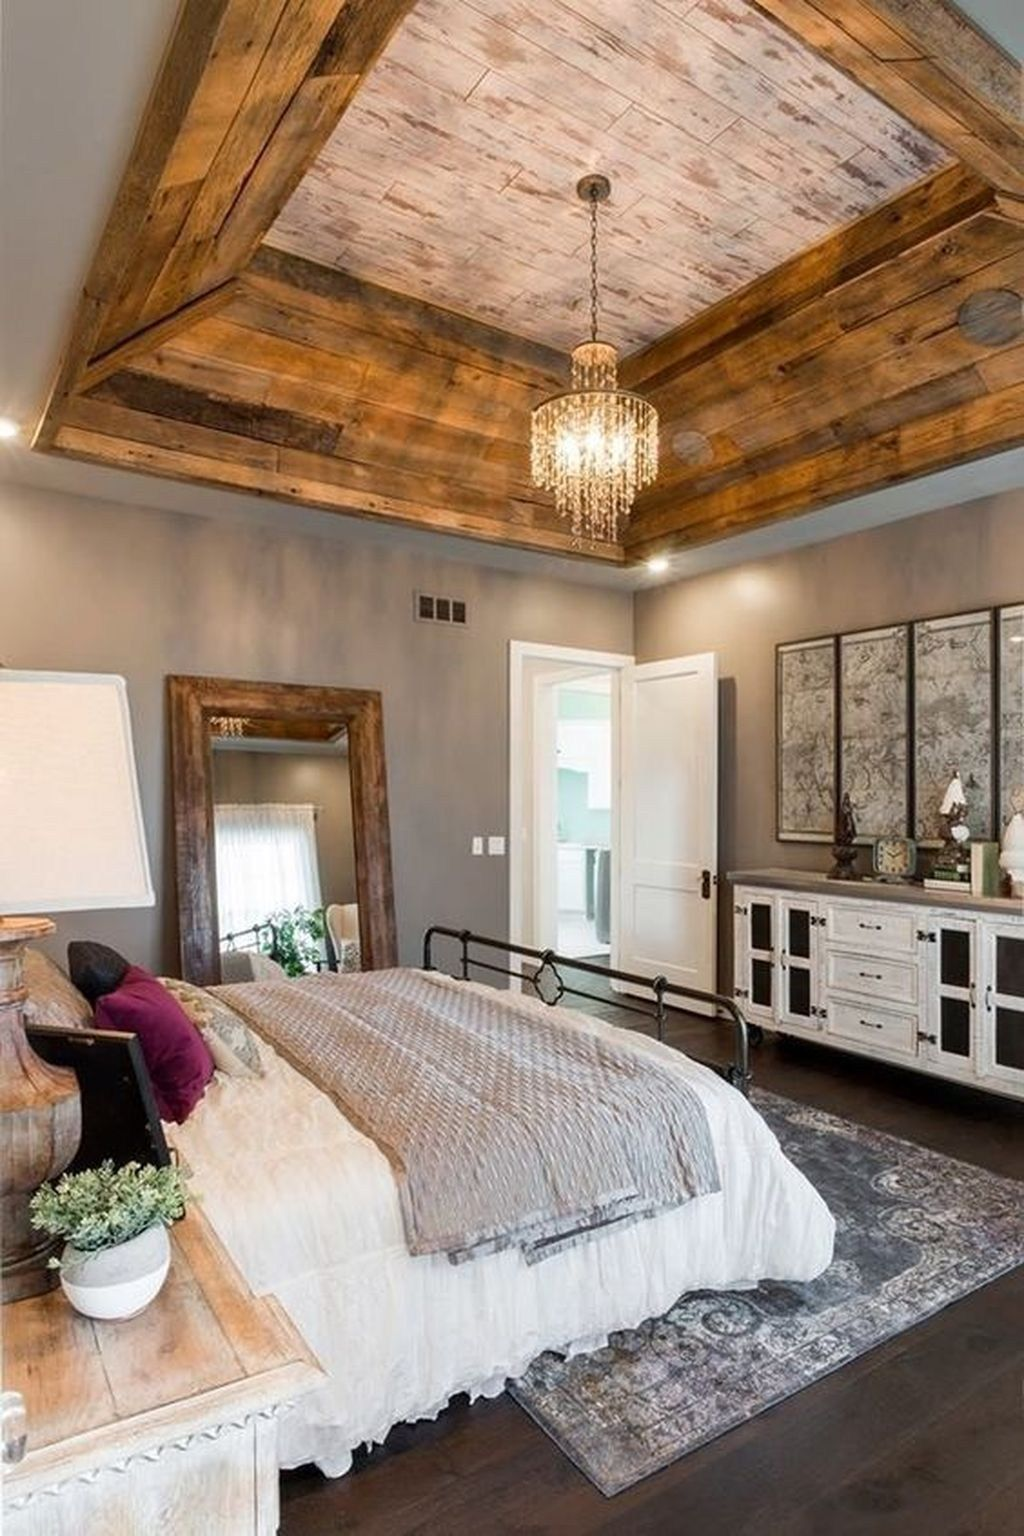 30 Wooden Rustic Furniture Master Bedrooms Ideas ...